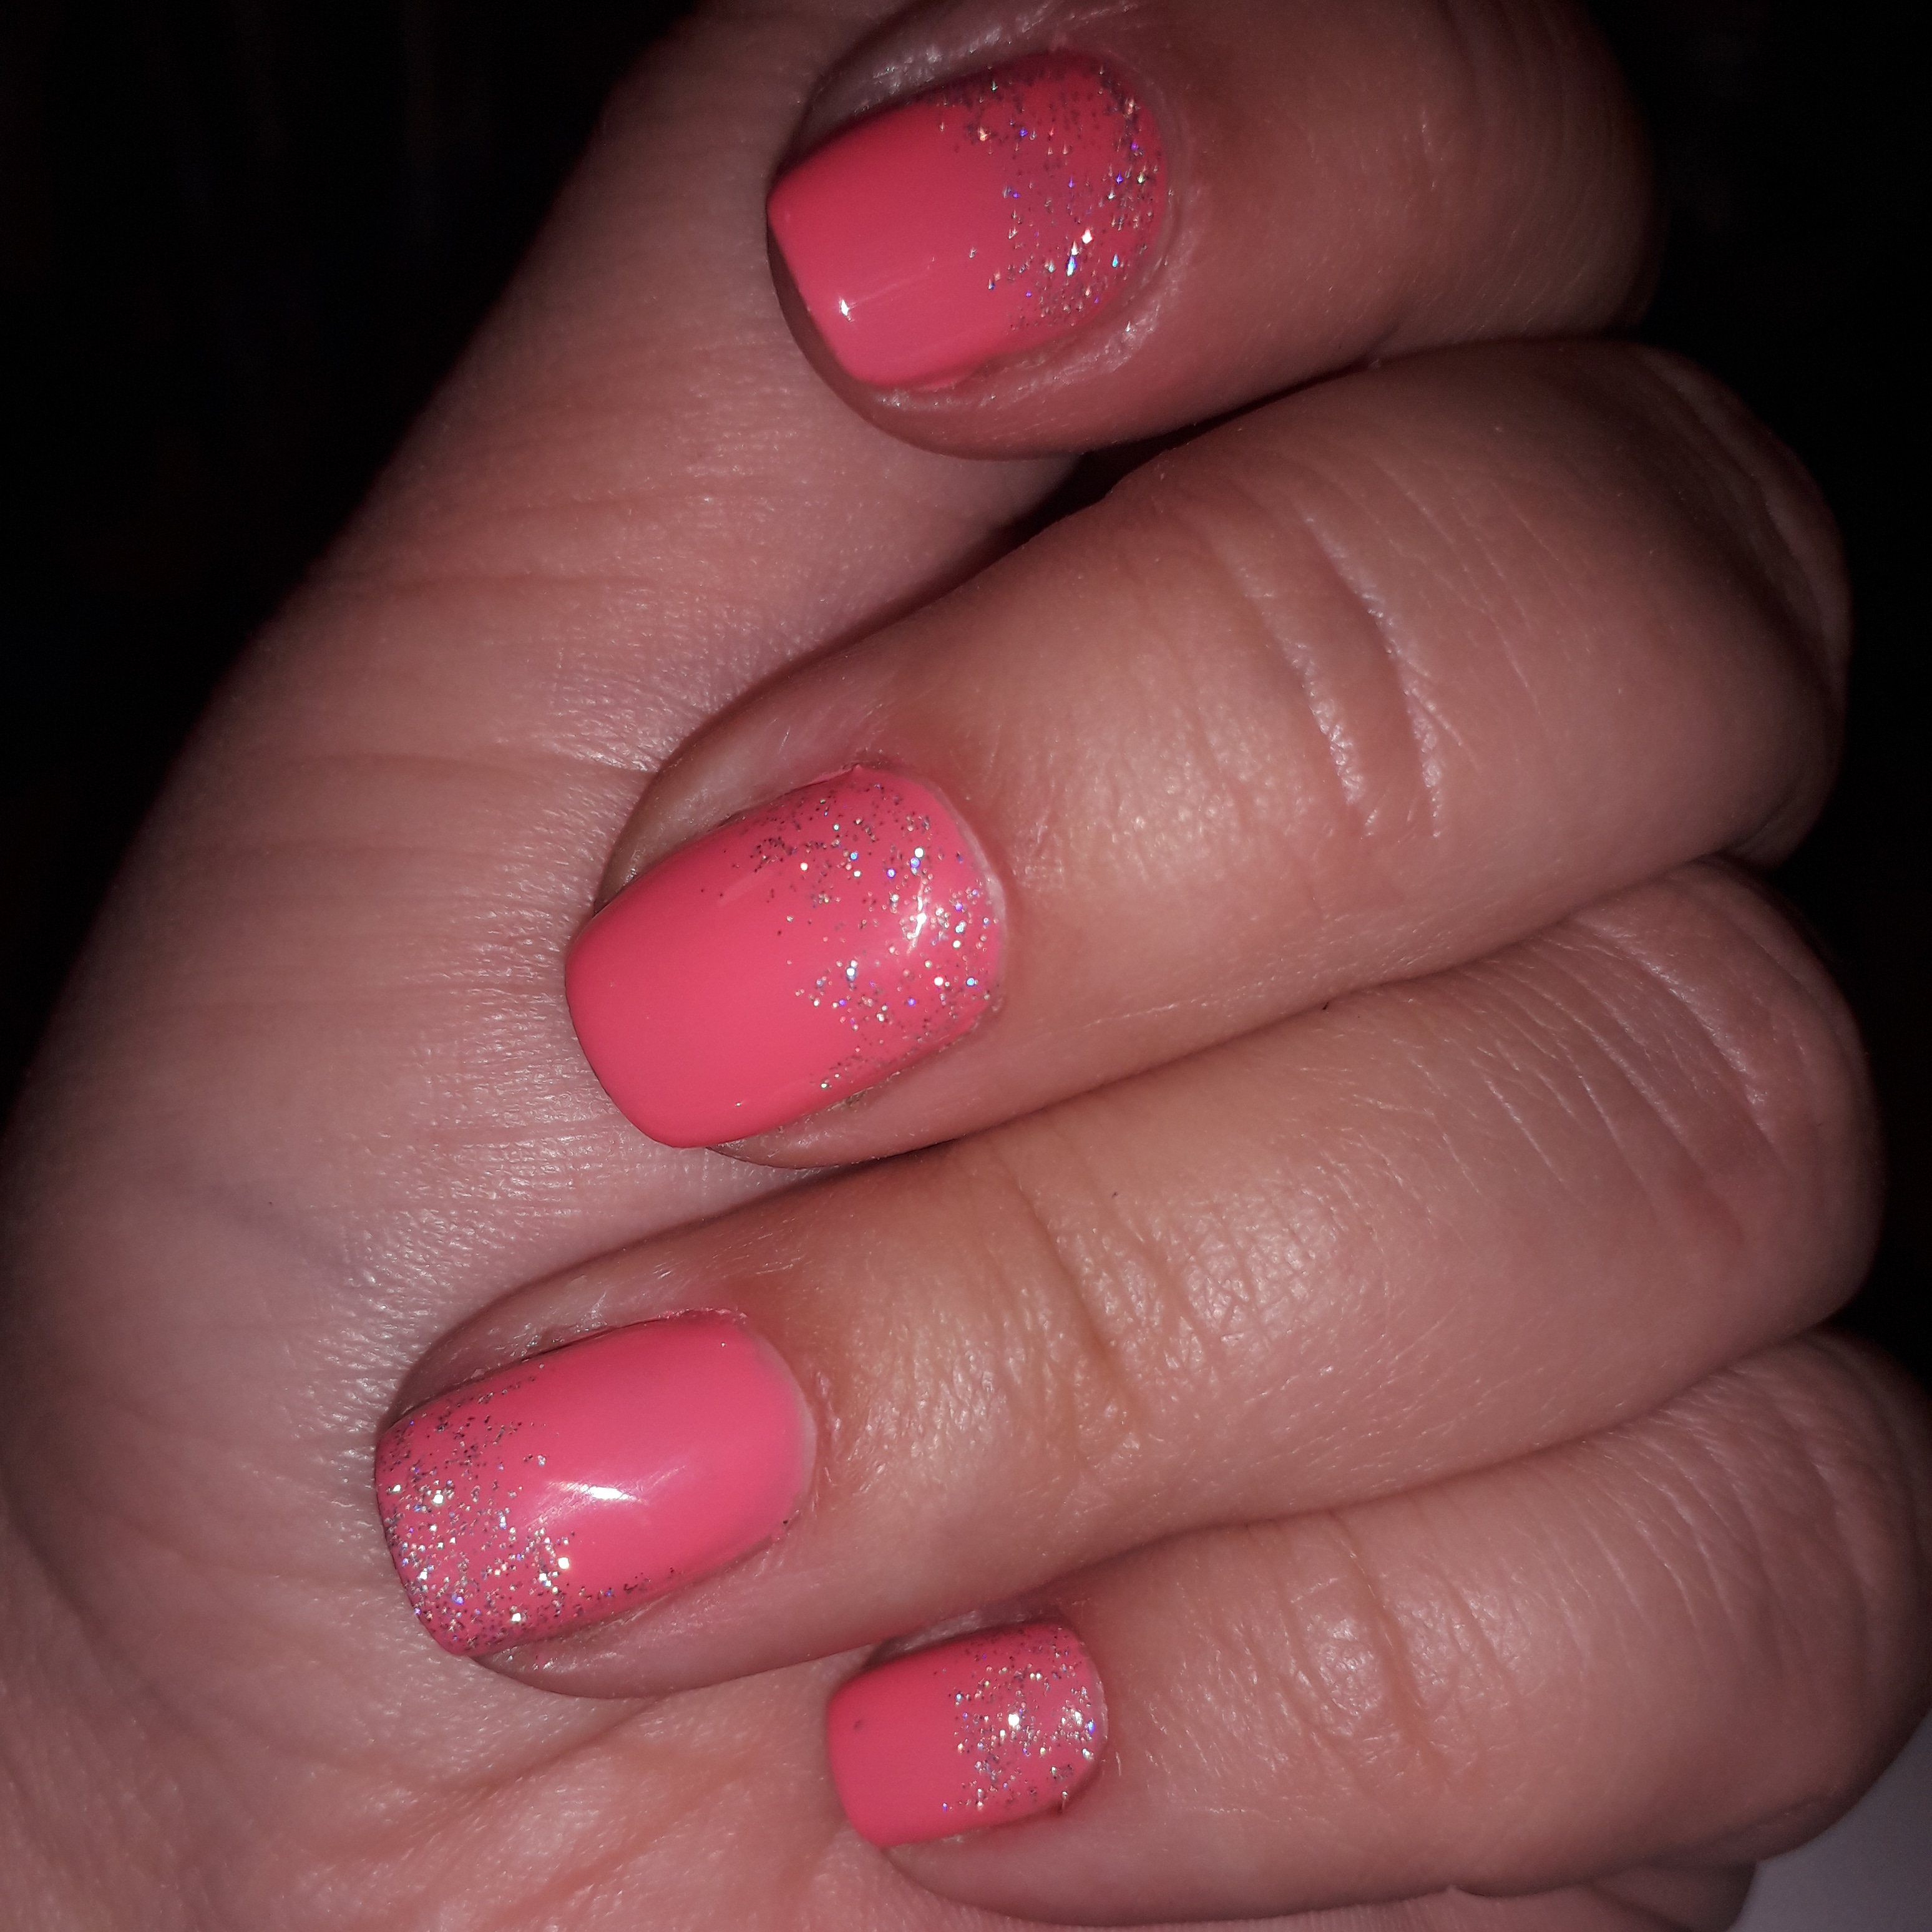 Маникюр с блестками с розовом цвете.